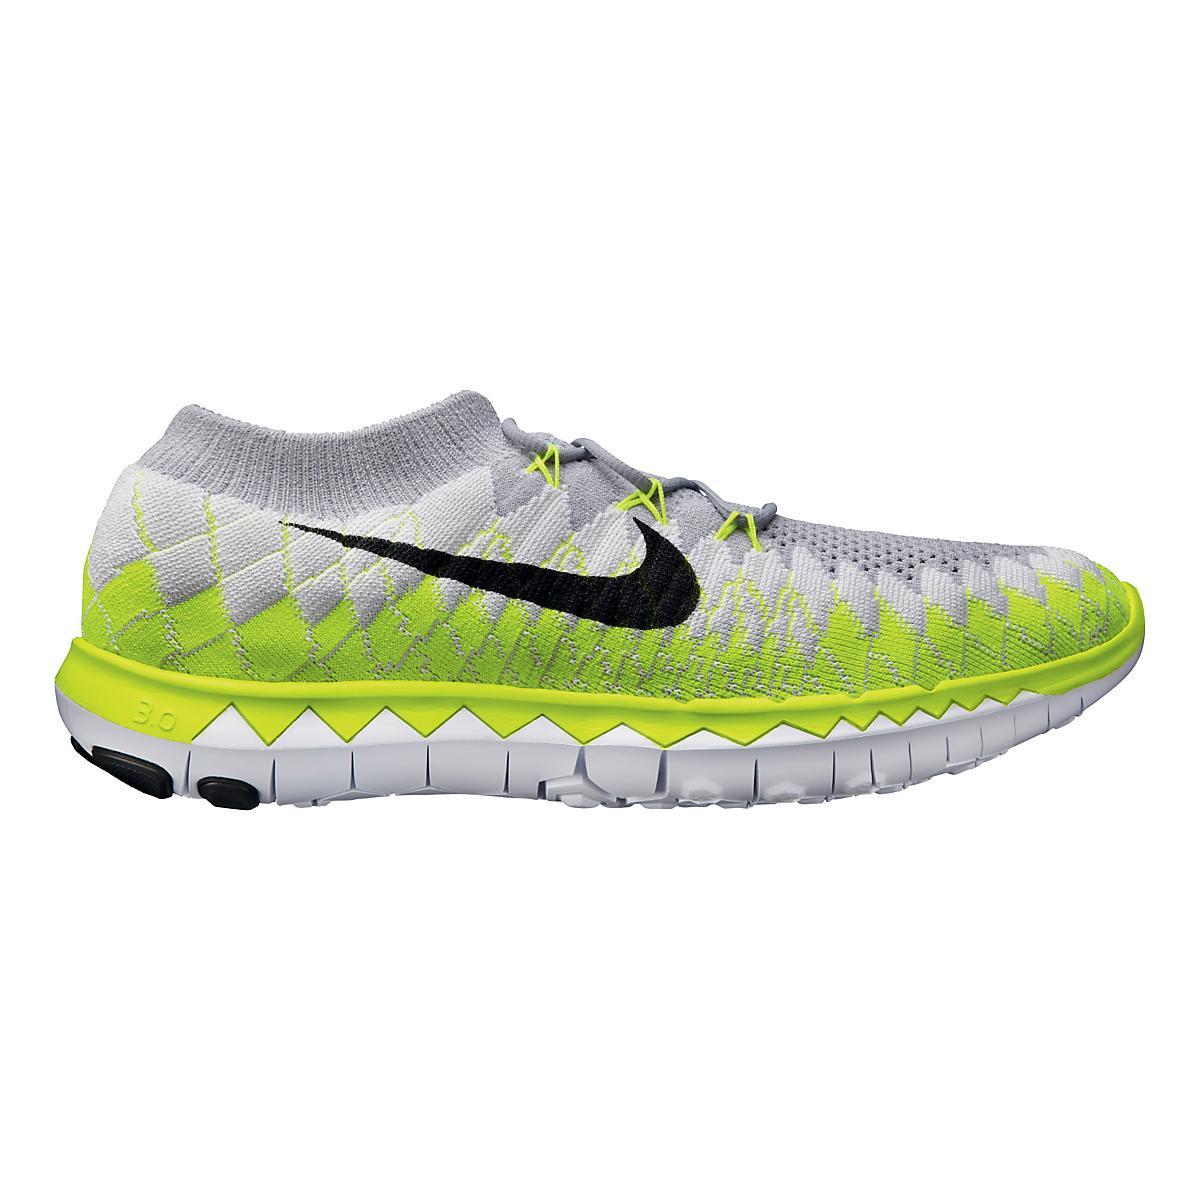 Road Shoe Mens Runner Nike At 0 Flyknit Sports Free Running 3 w468q8nxSa